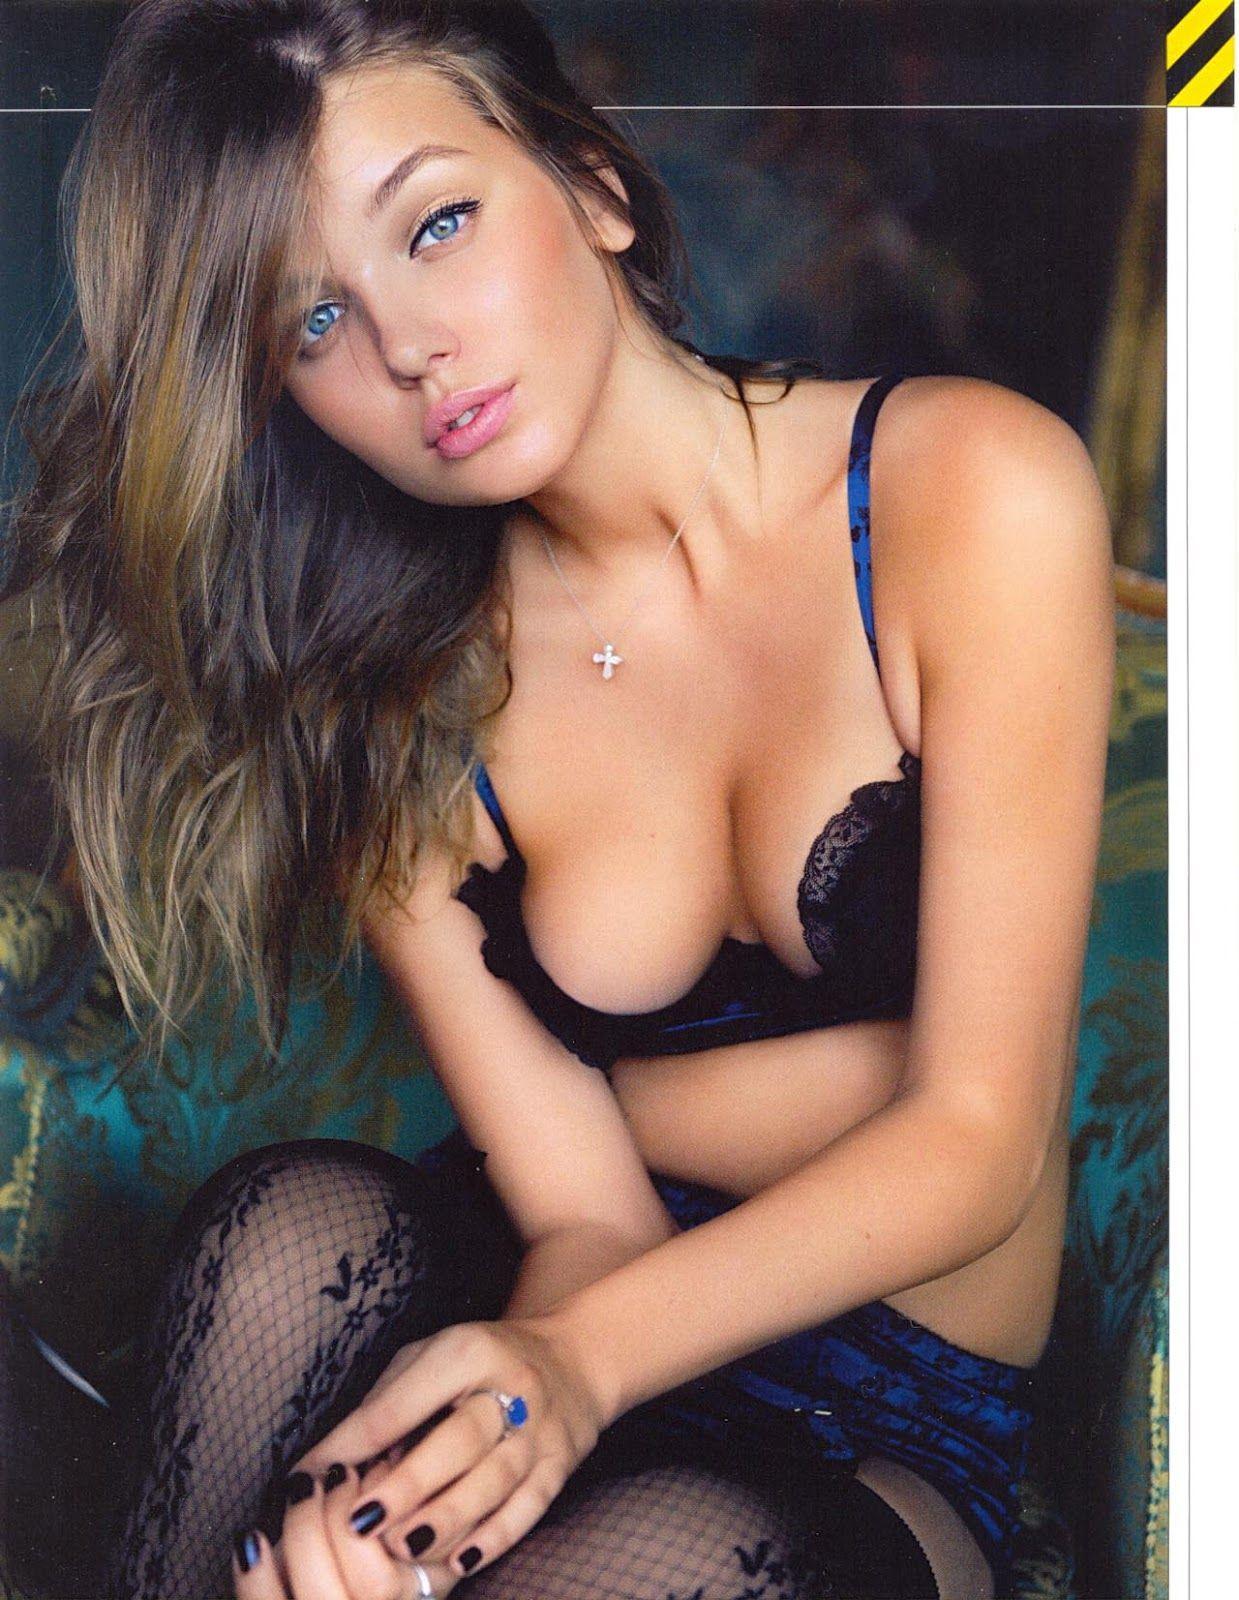 Hot webcam model double dildo penetration 3